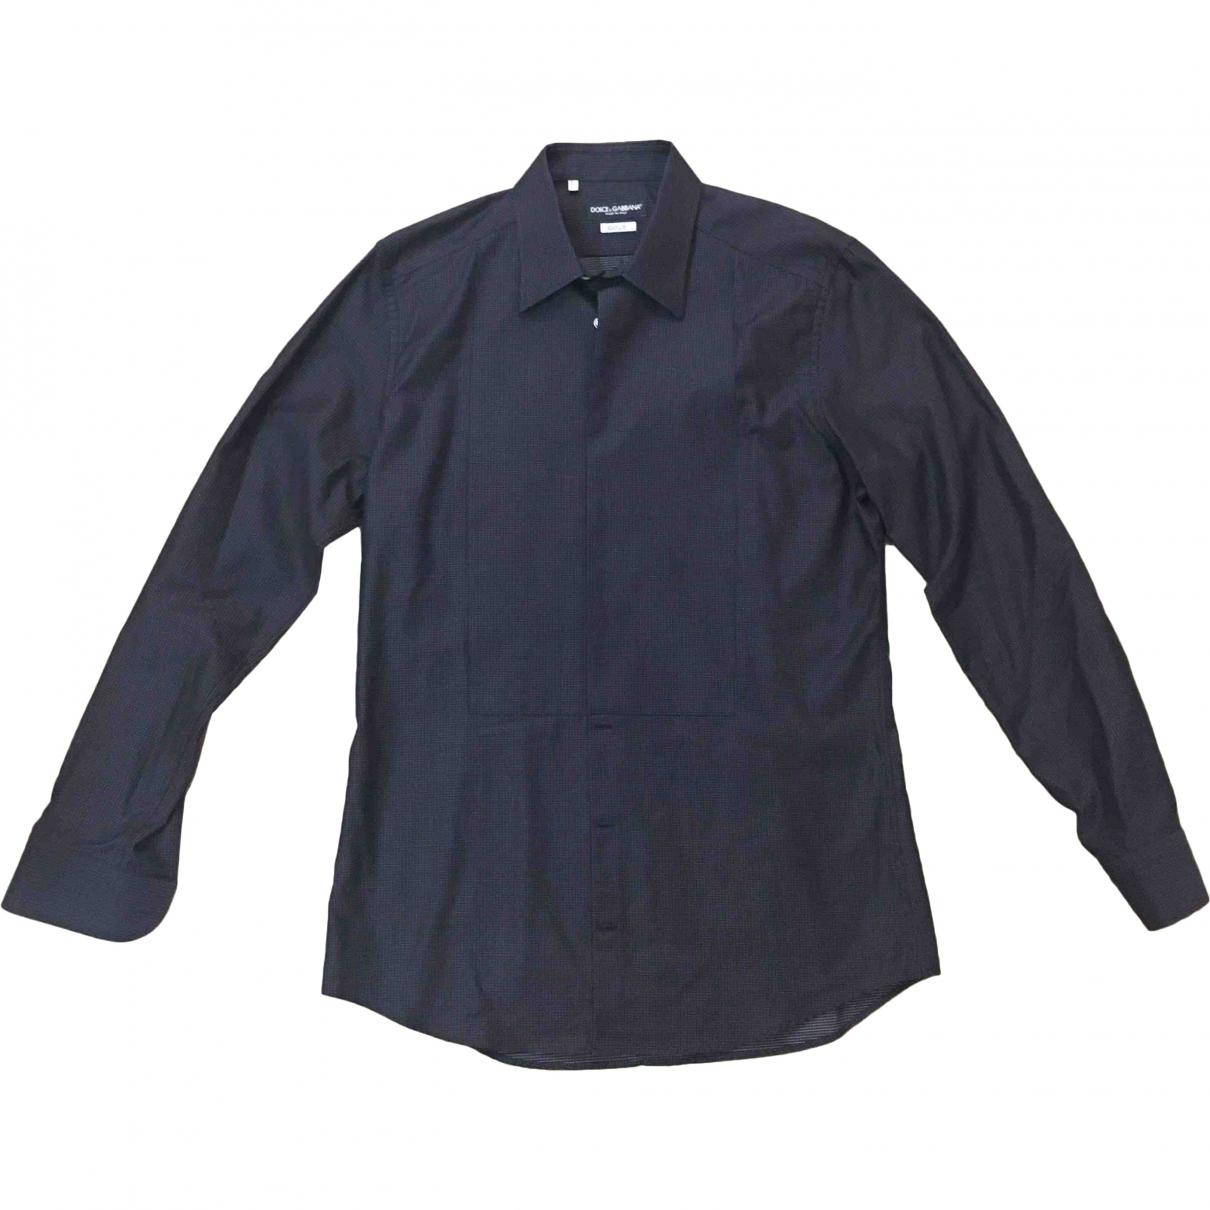 Dolce & Gabbana \N Black Cotton Shirts for Men 42 EU (tour de cou / collar)